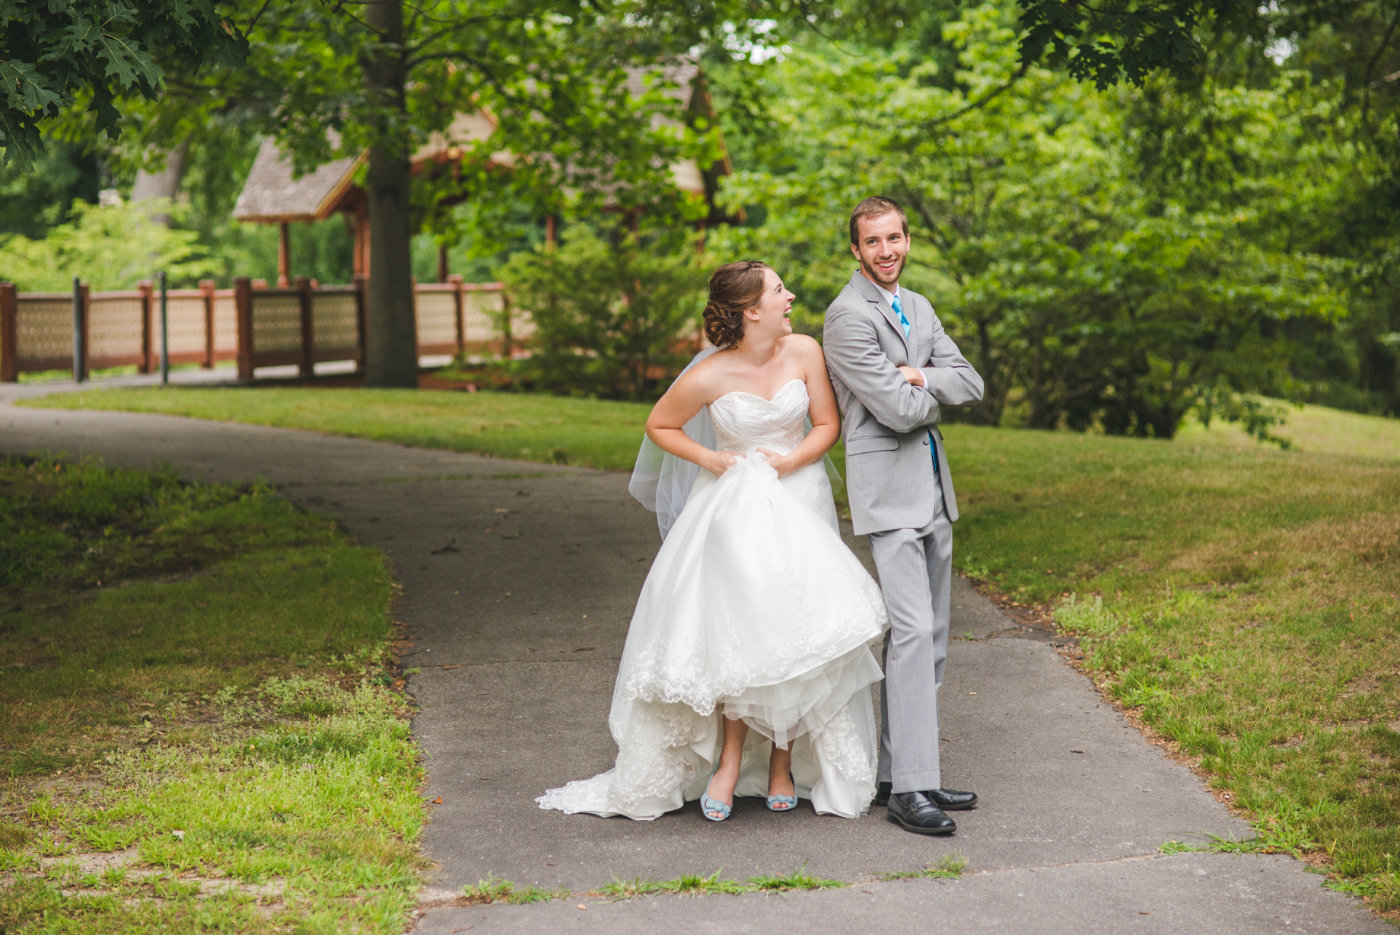 Weddings Charlotte Wedding Venues Wedding Photography Ideas Wedding